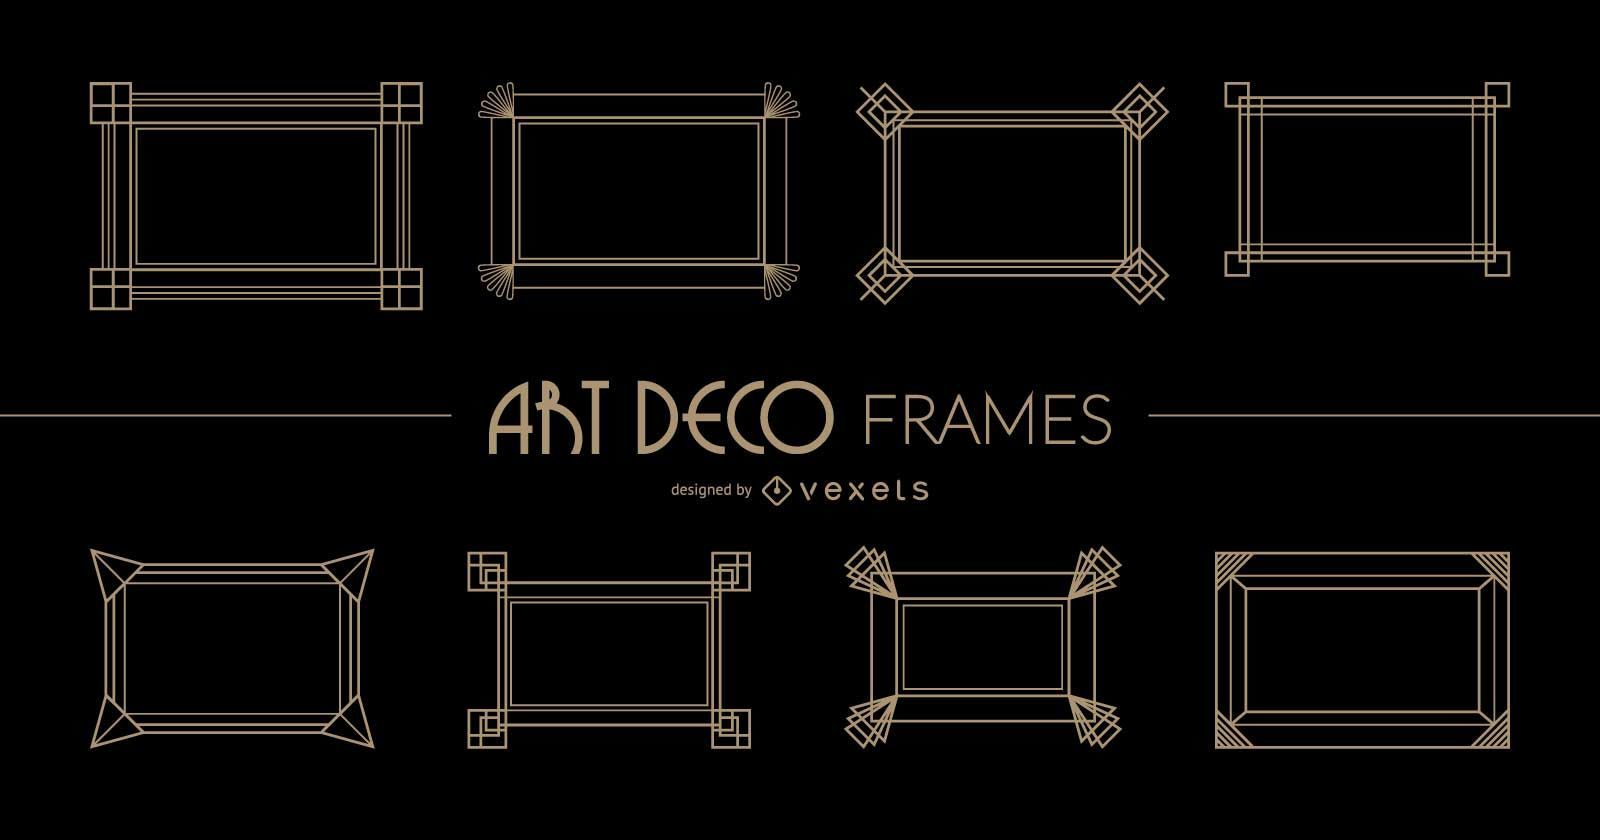 Marcos Art Deco rectangulares